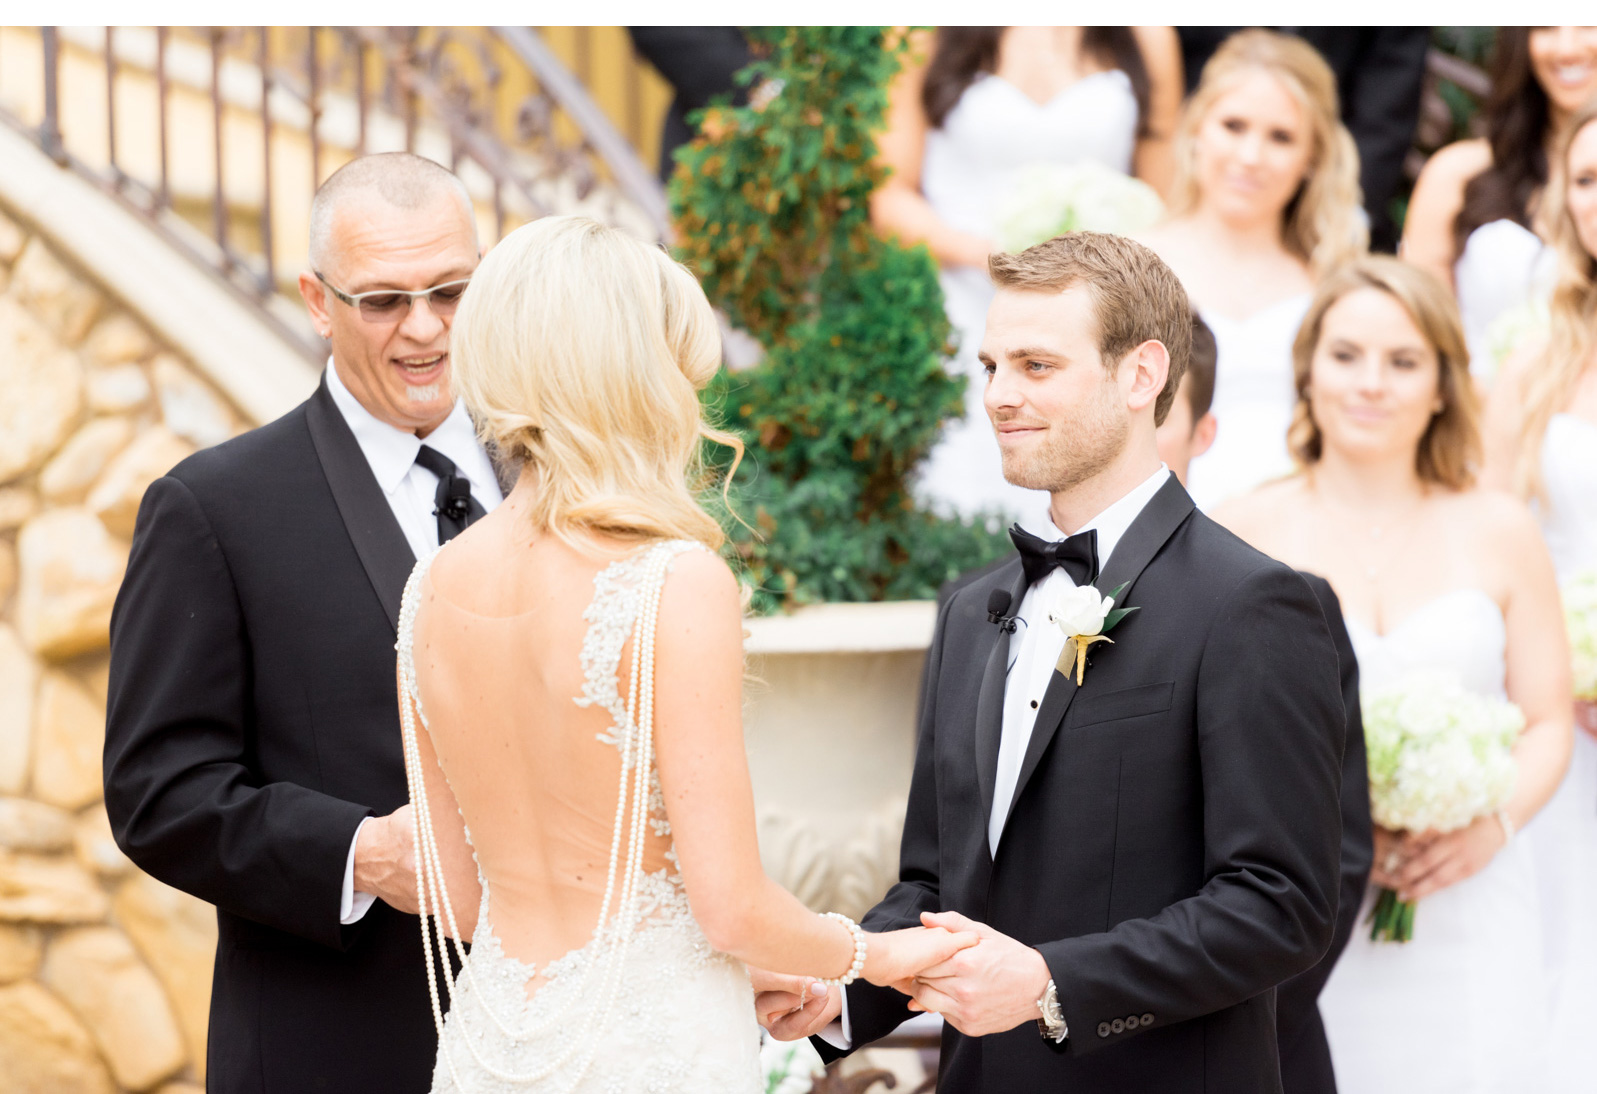 Southern-California-Wedding-Photographer-Natalie-Schutt-Photography_23.jpg